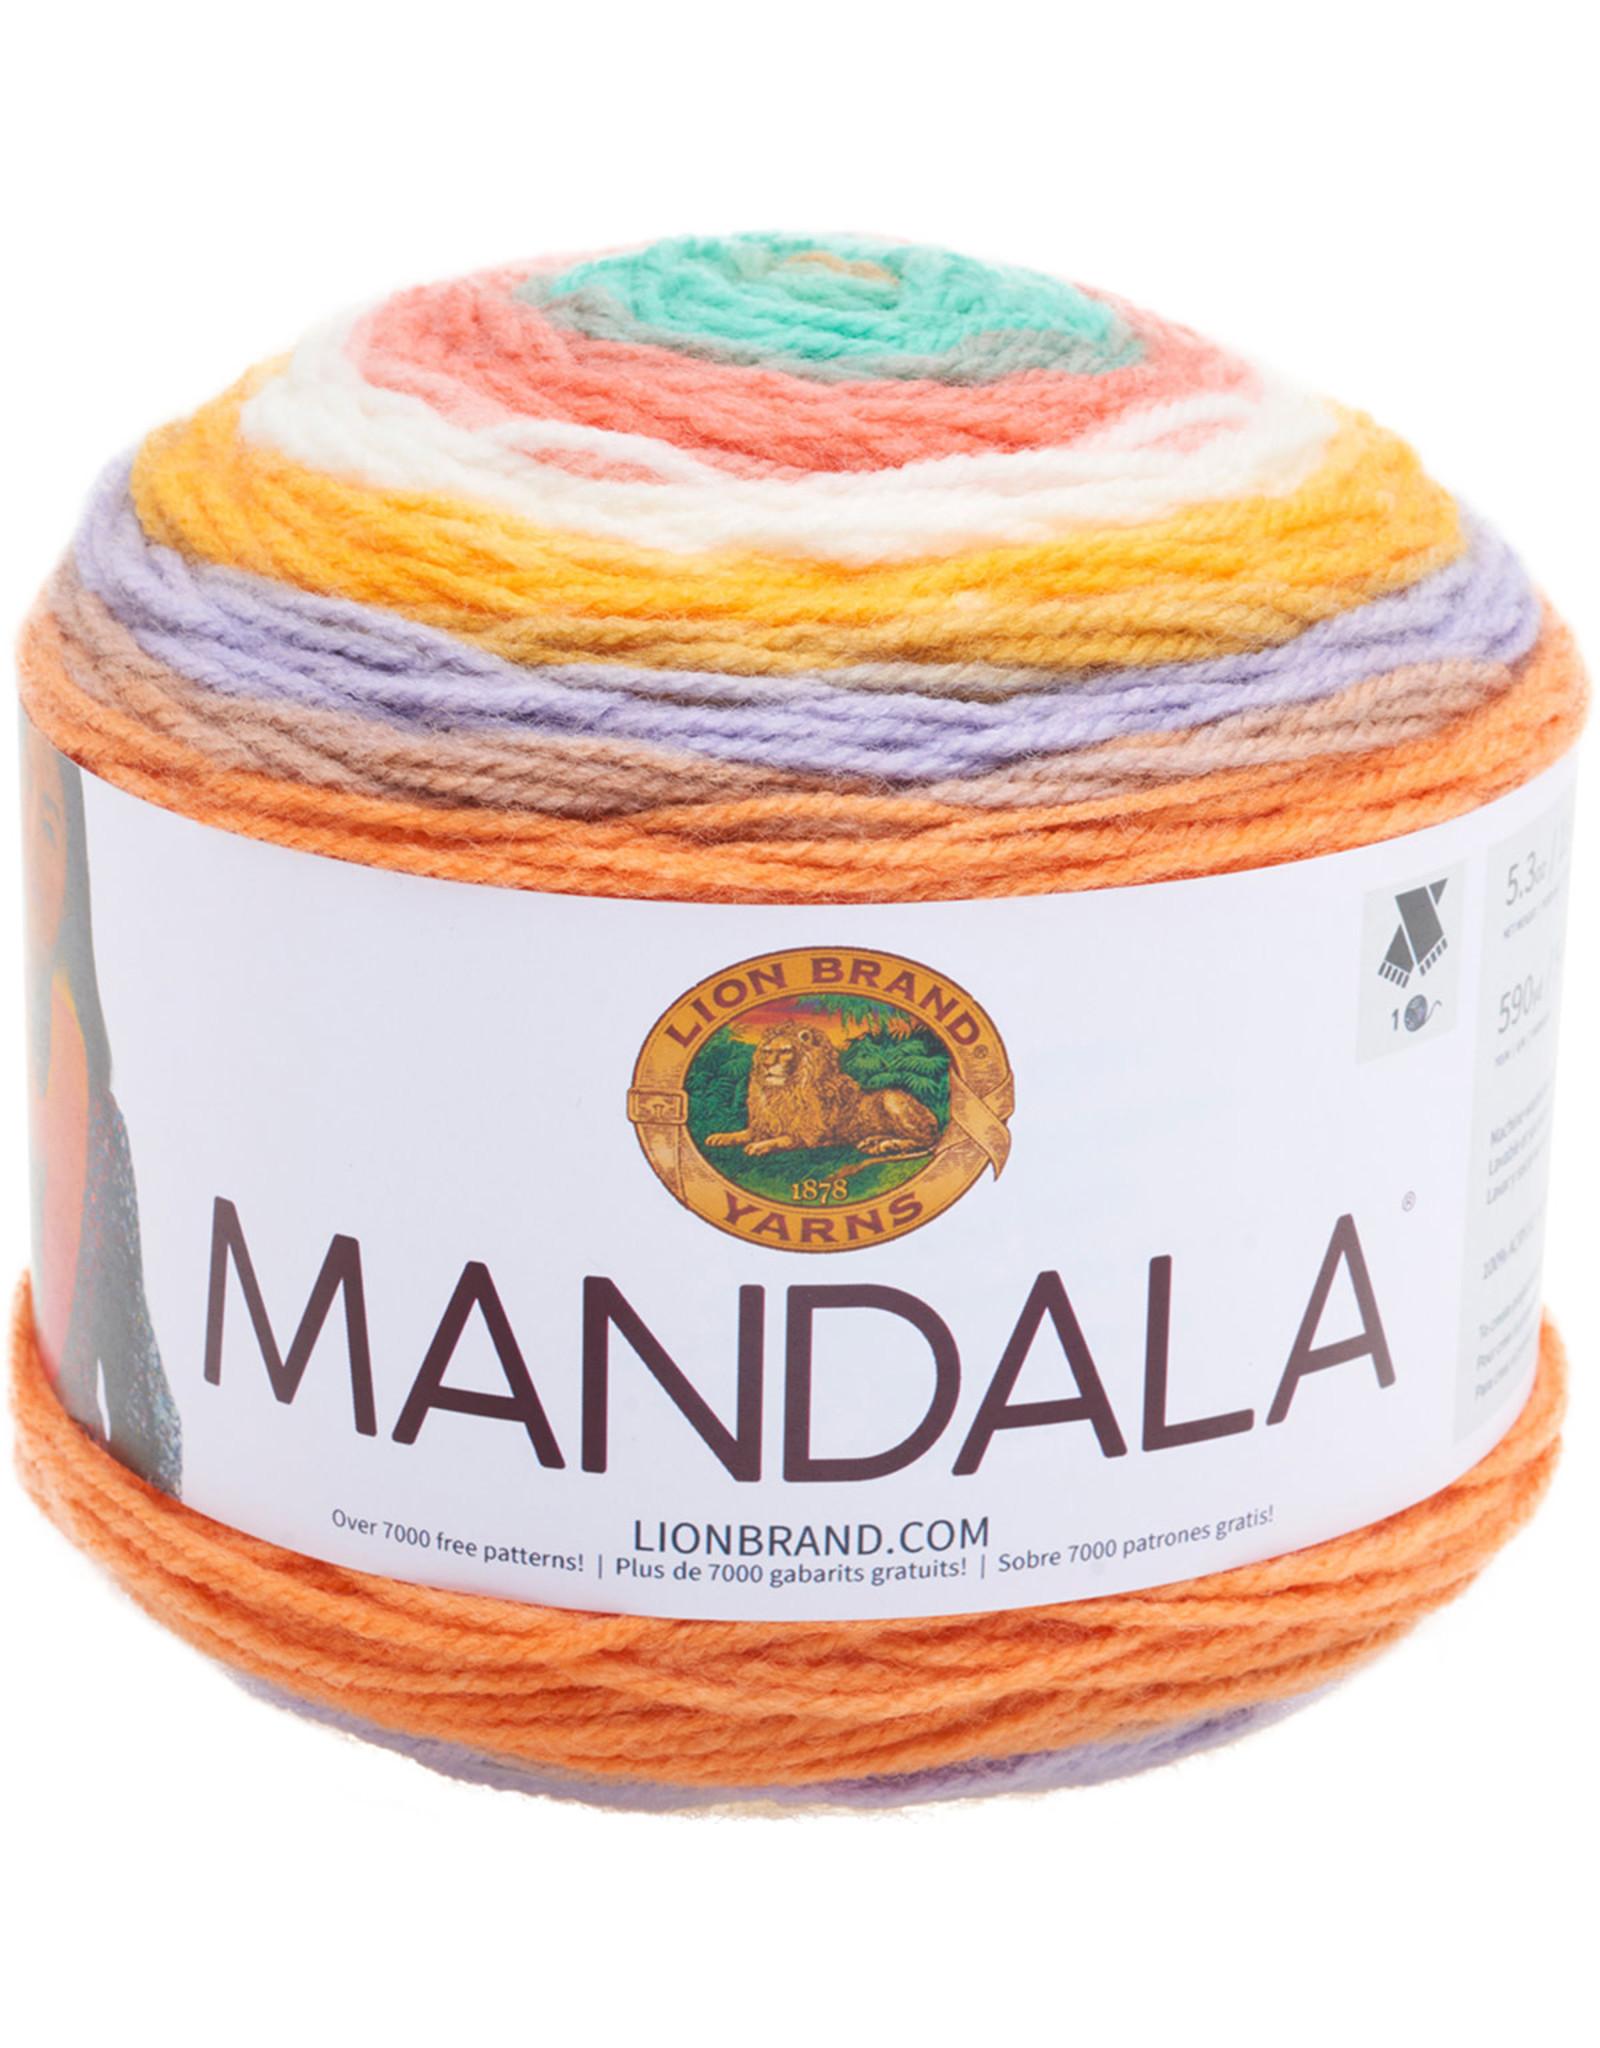 Pixie - Mandala - Lion Brand